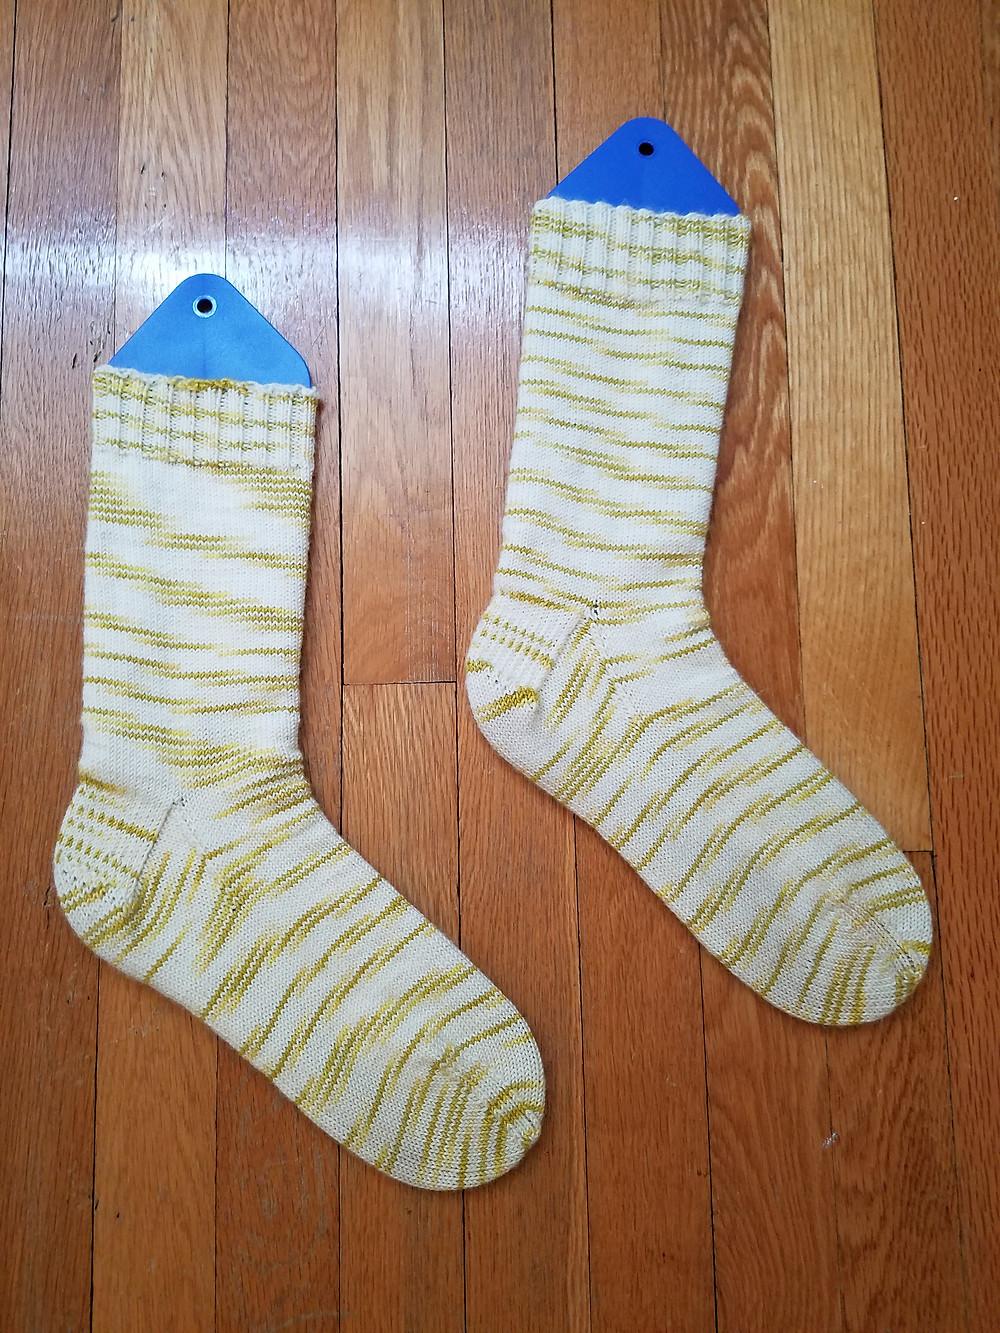 The Basic Sock pattern by Ann Budd